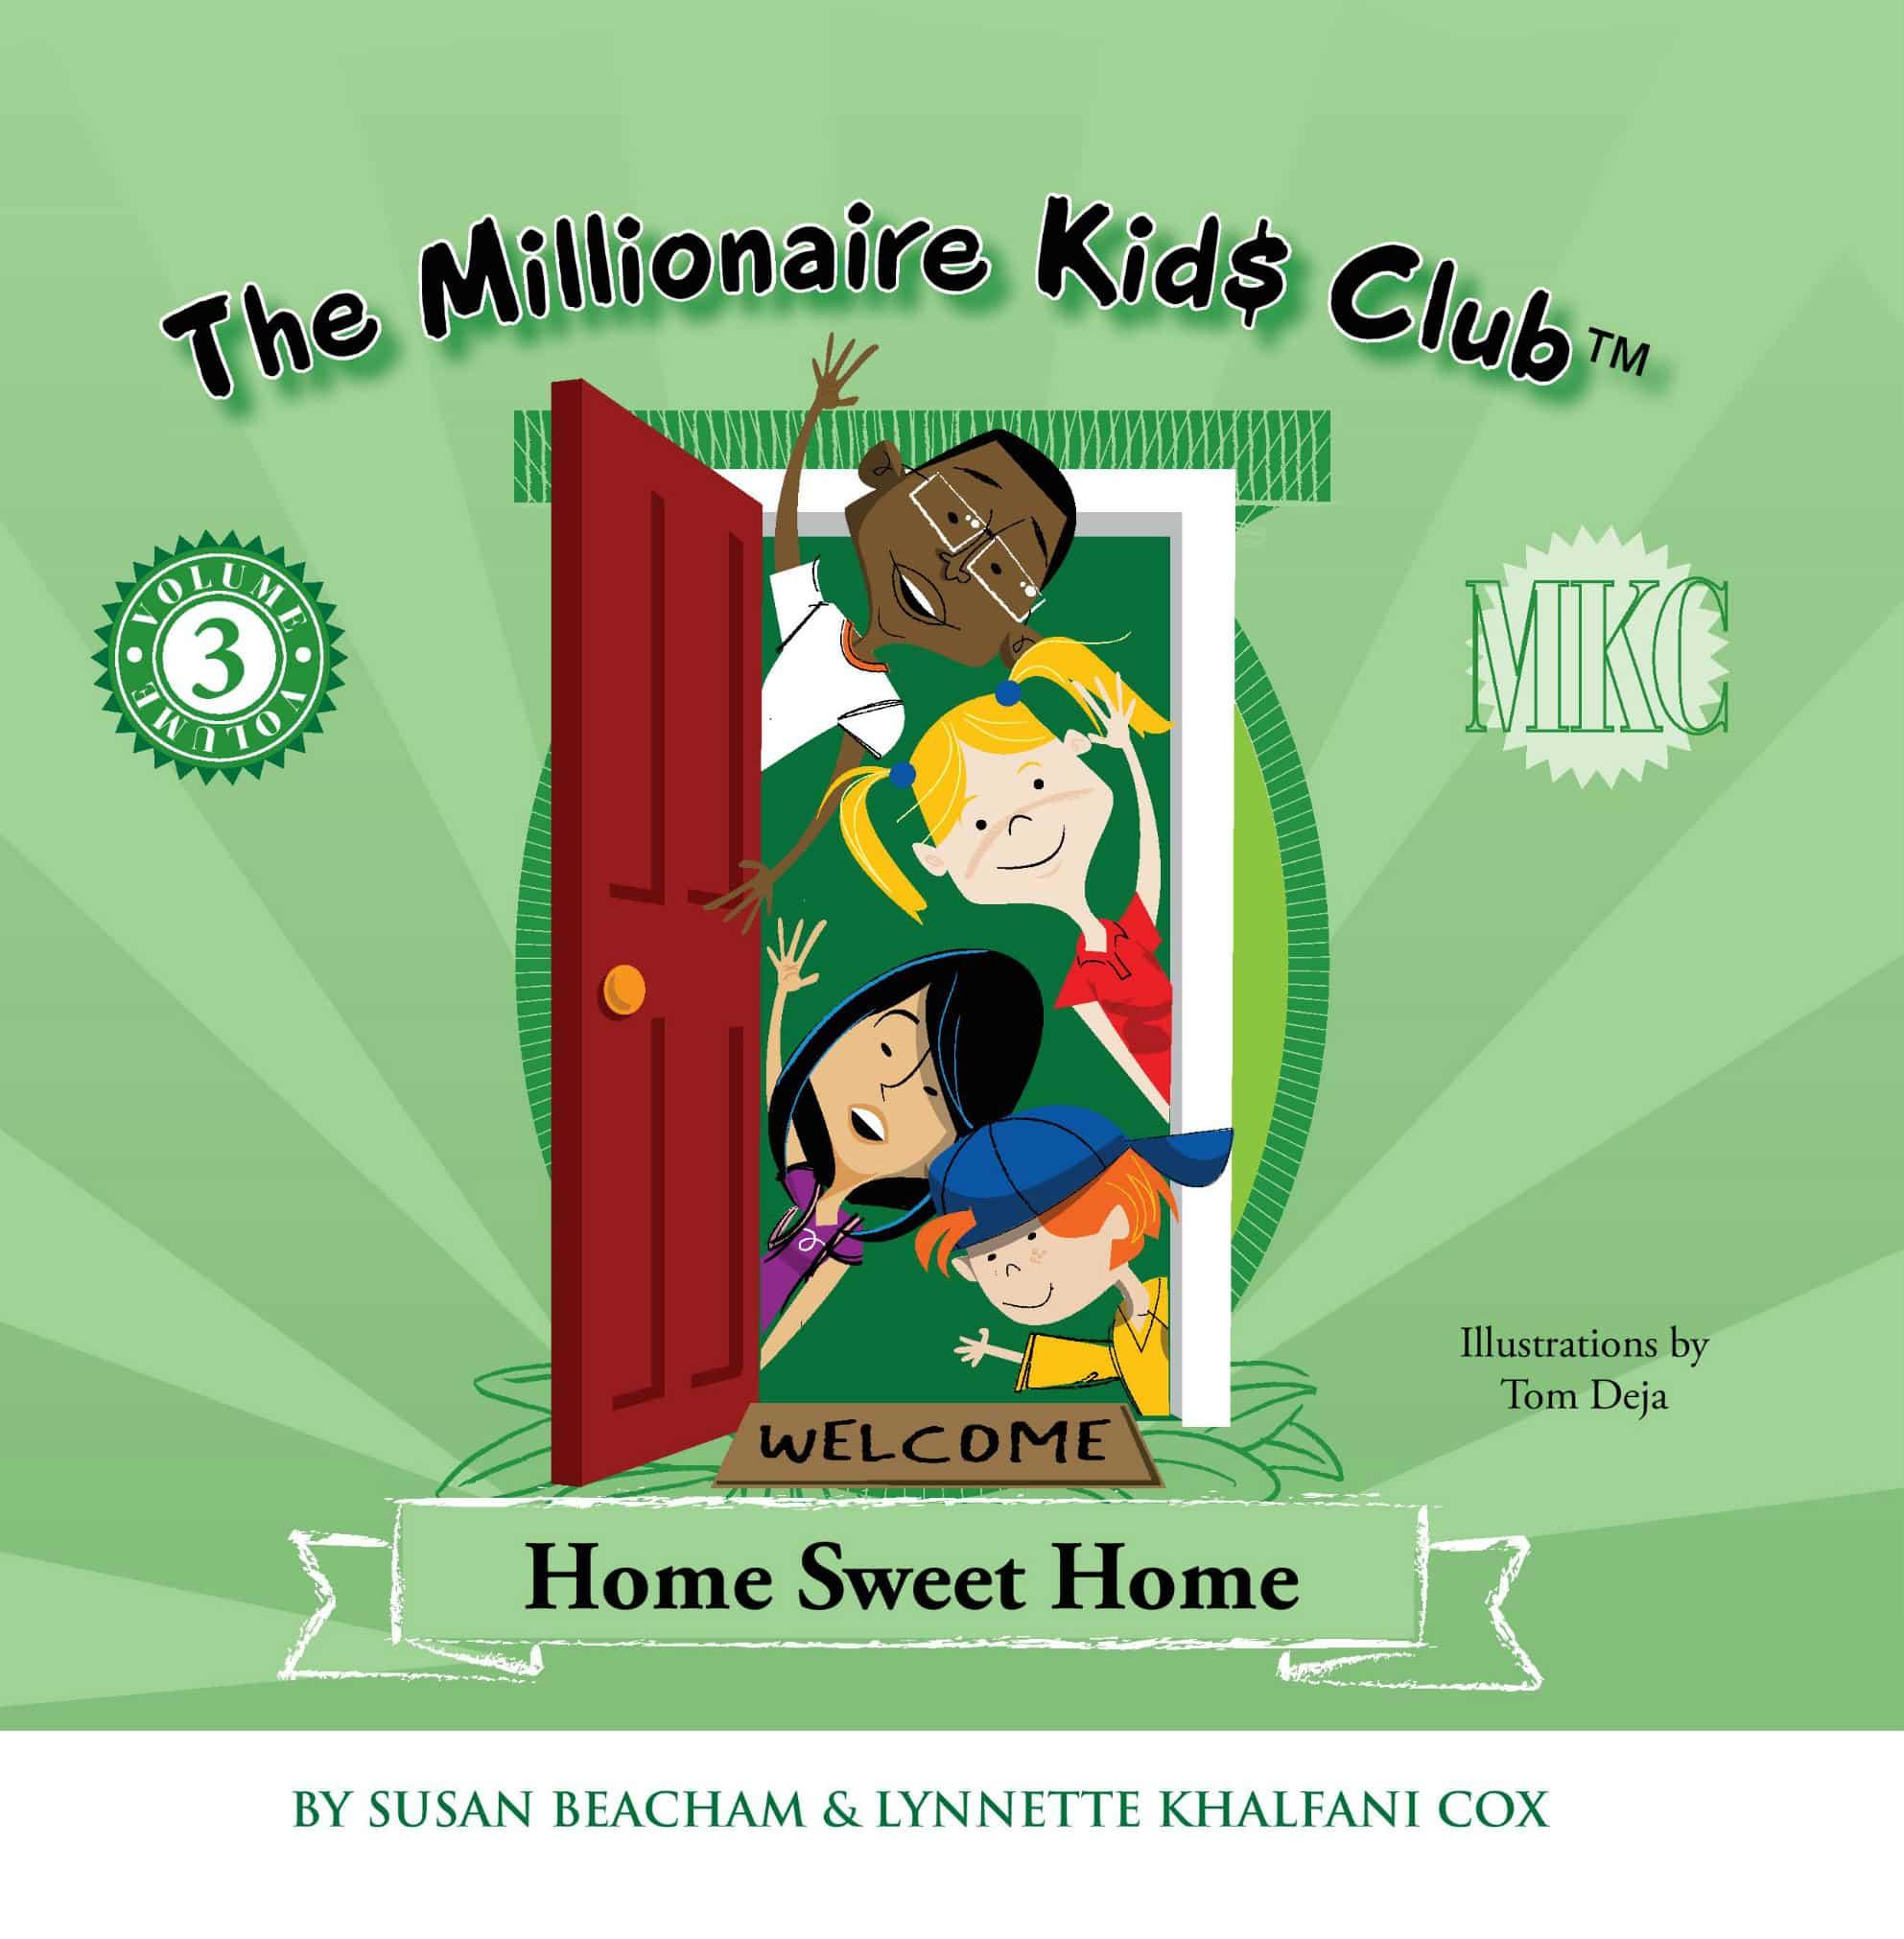 The Millionaire Kids Club: Home Sweet Home